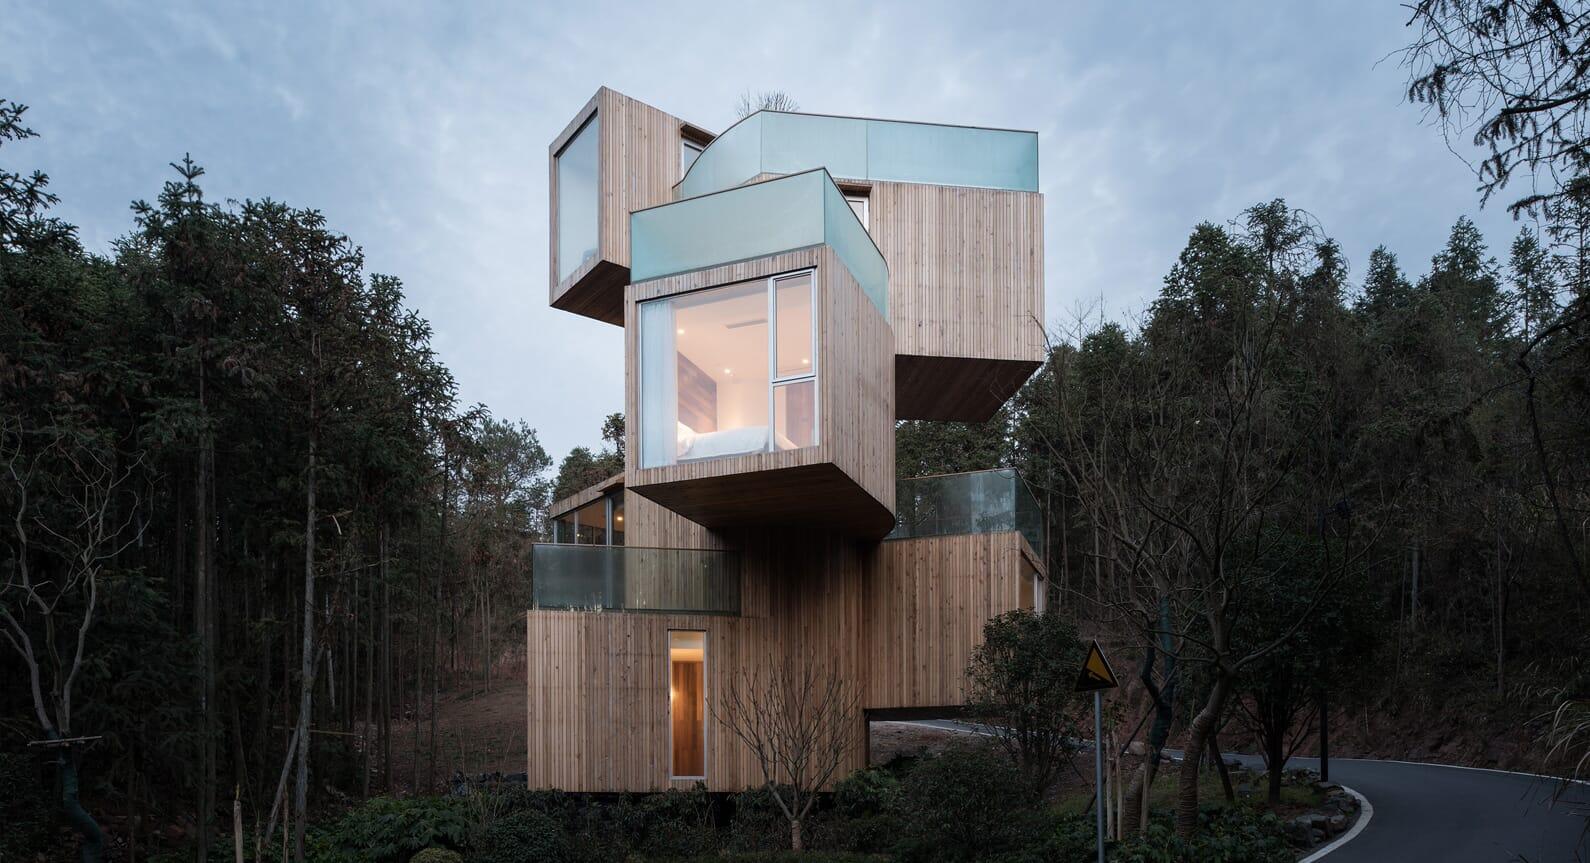 Take a Look Inside Bengo Studio's Towering Tree House